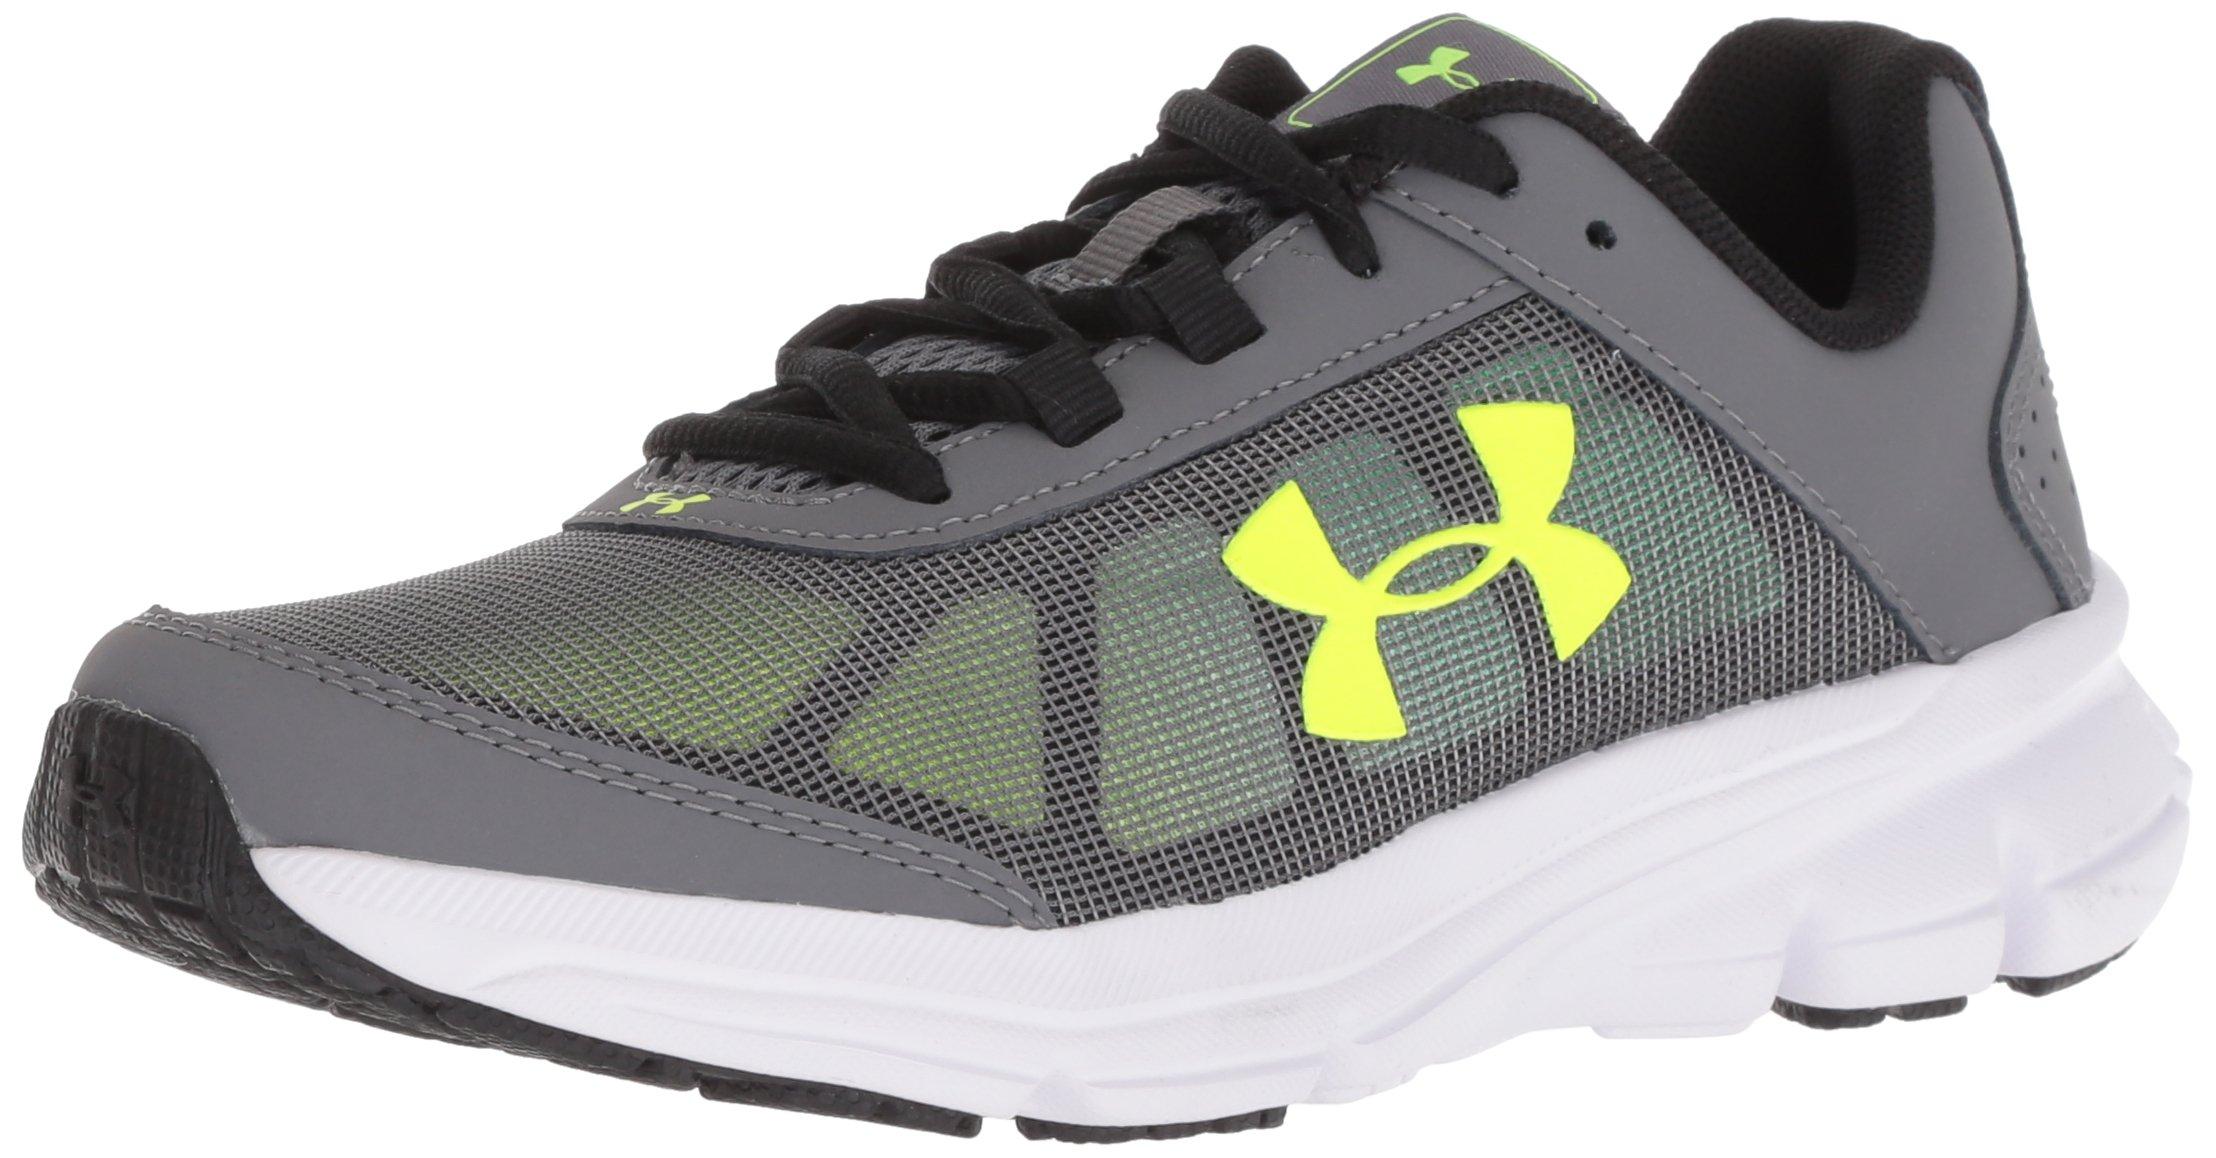 Under Armour Kids' Grade School Rave 2 Sneaker,Graphite (102)/White,5.5 M US